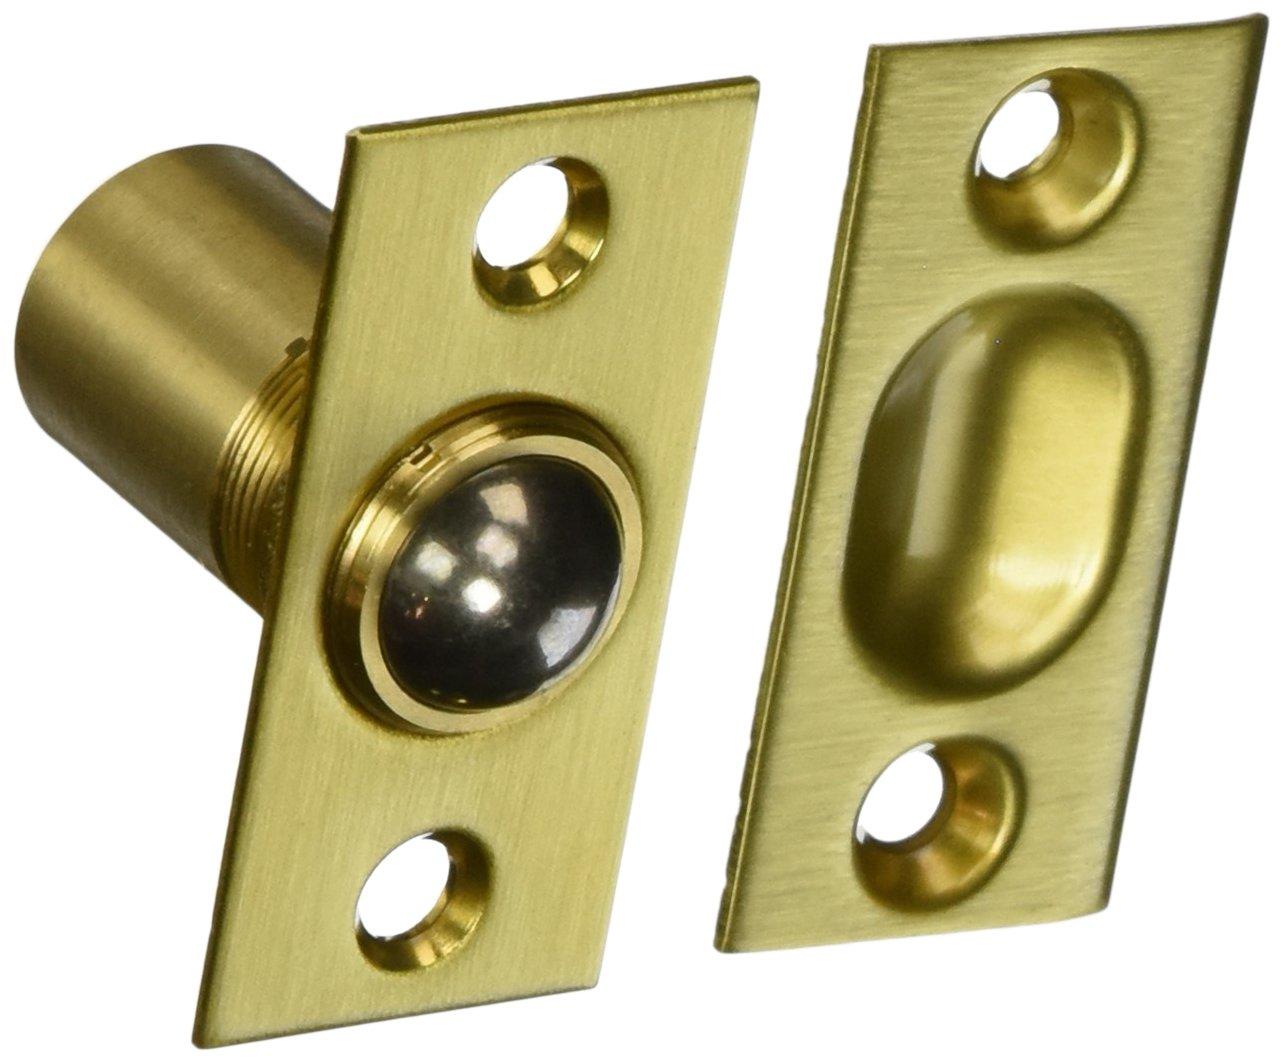 Oil Rubber Bronze Baldwin 0425.102 Adjustable Ball Catch